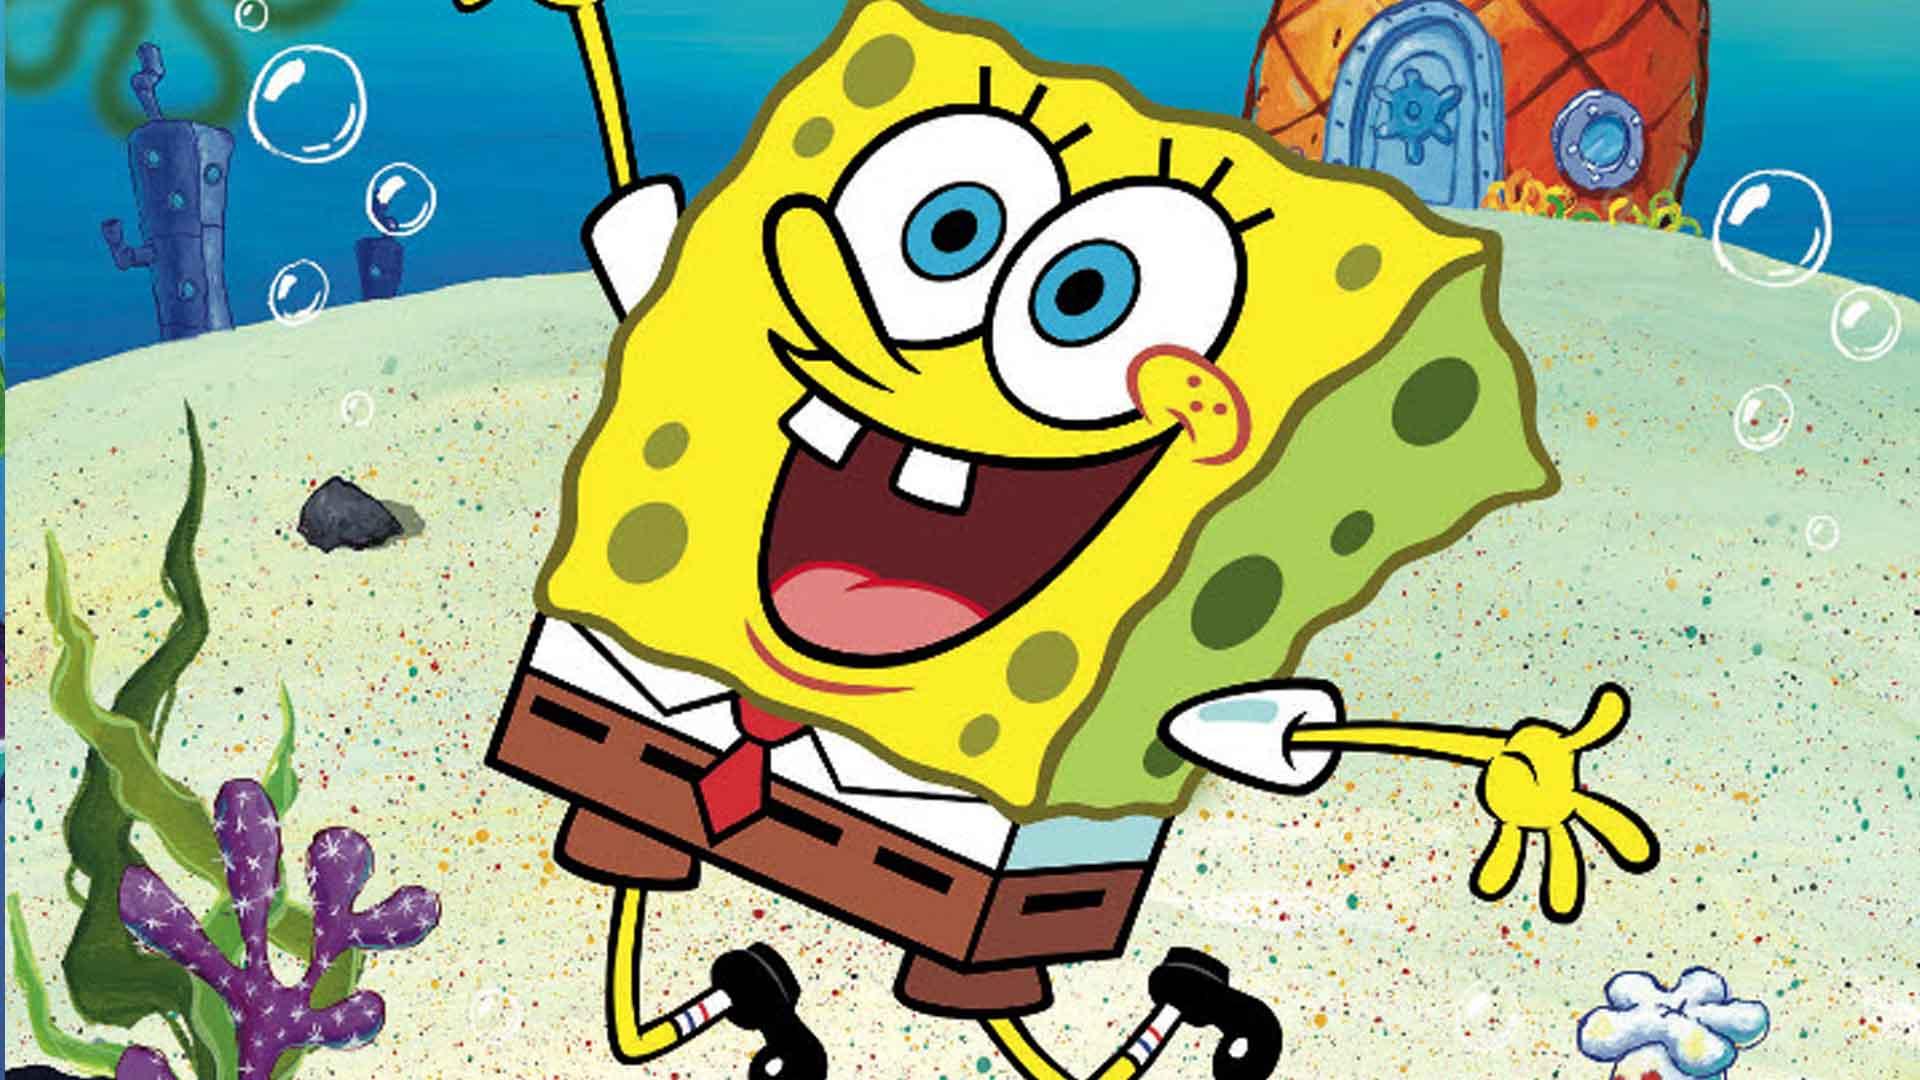 spongebob squarepants shows cúla4 tg4 súil eile